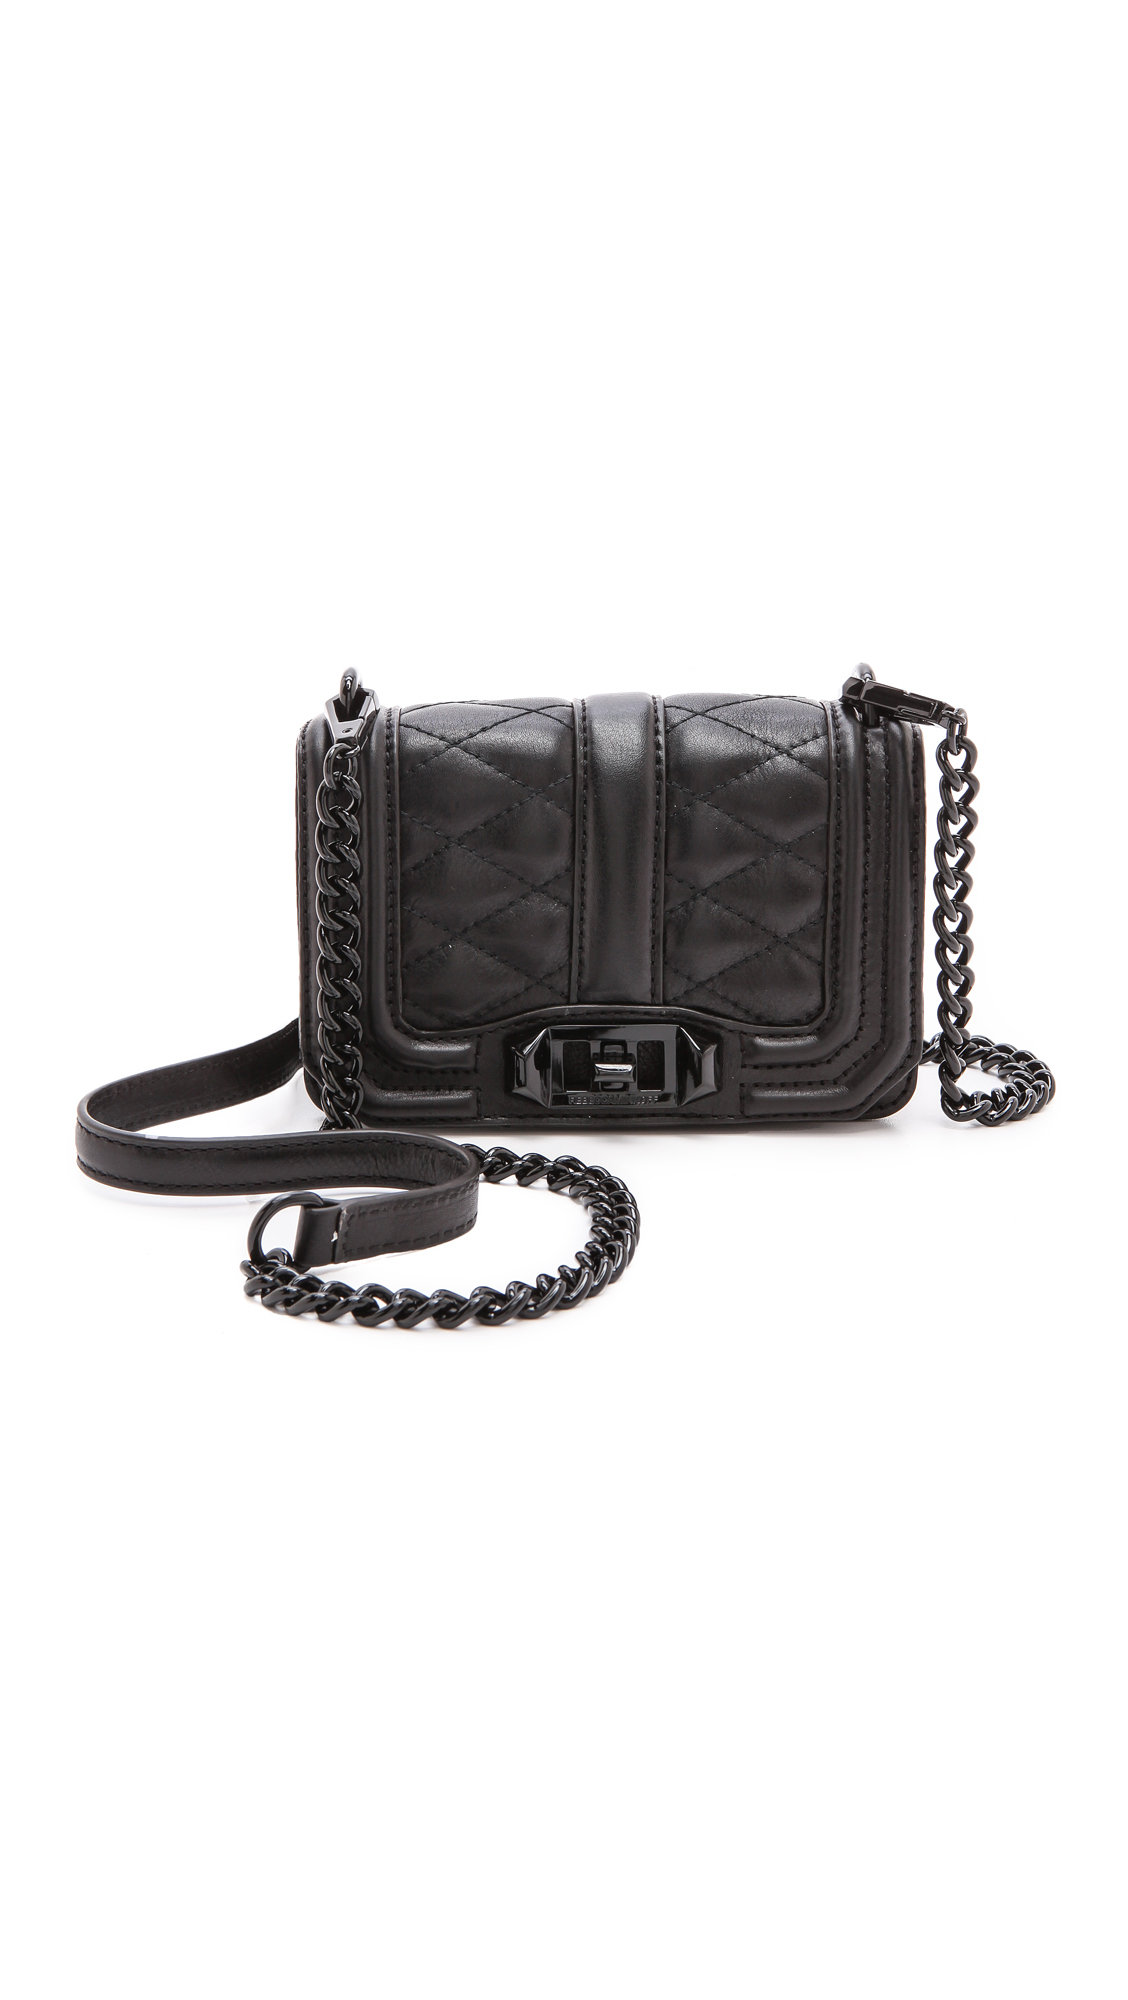 Rebecca minkoff Love Crossbody Bag in Black